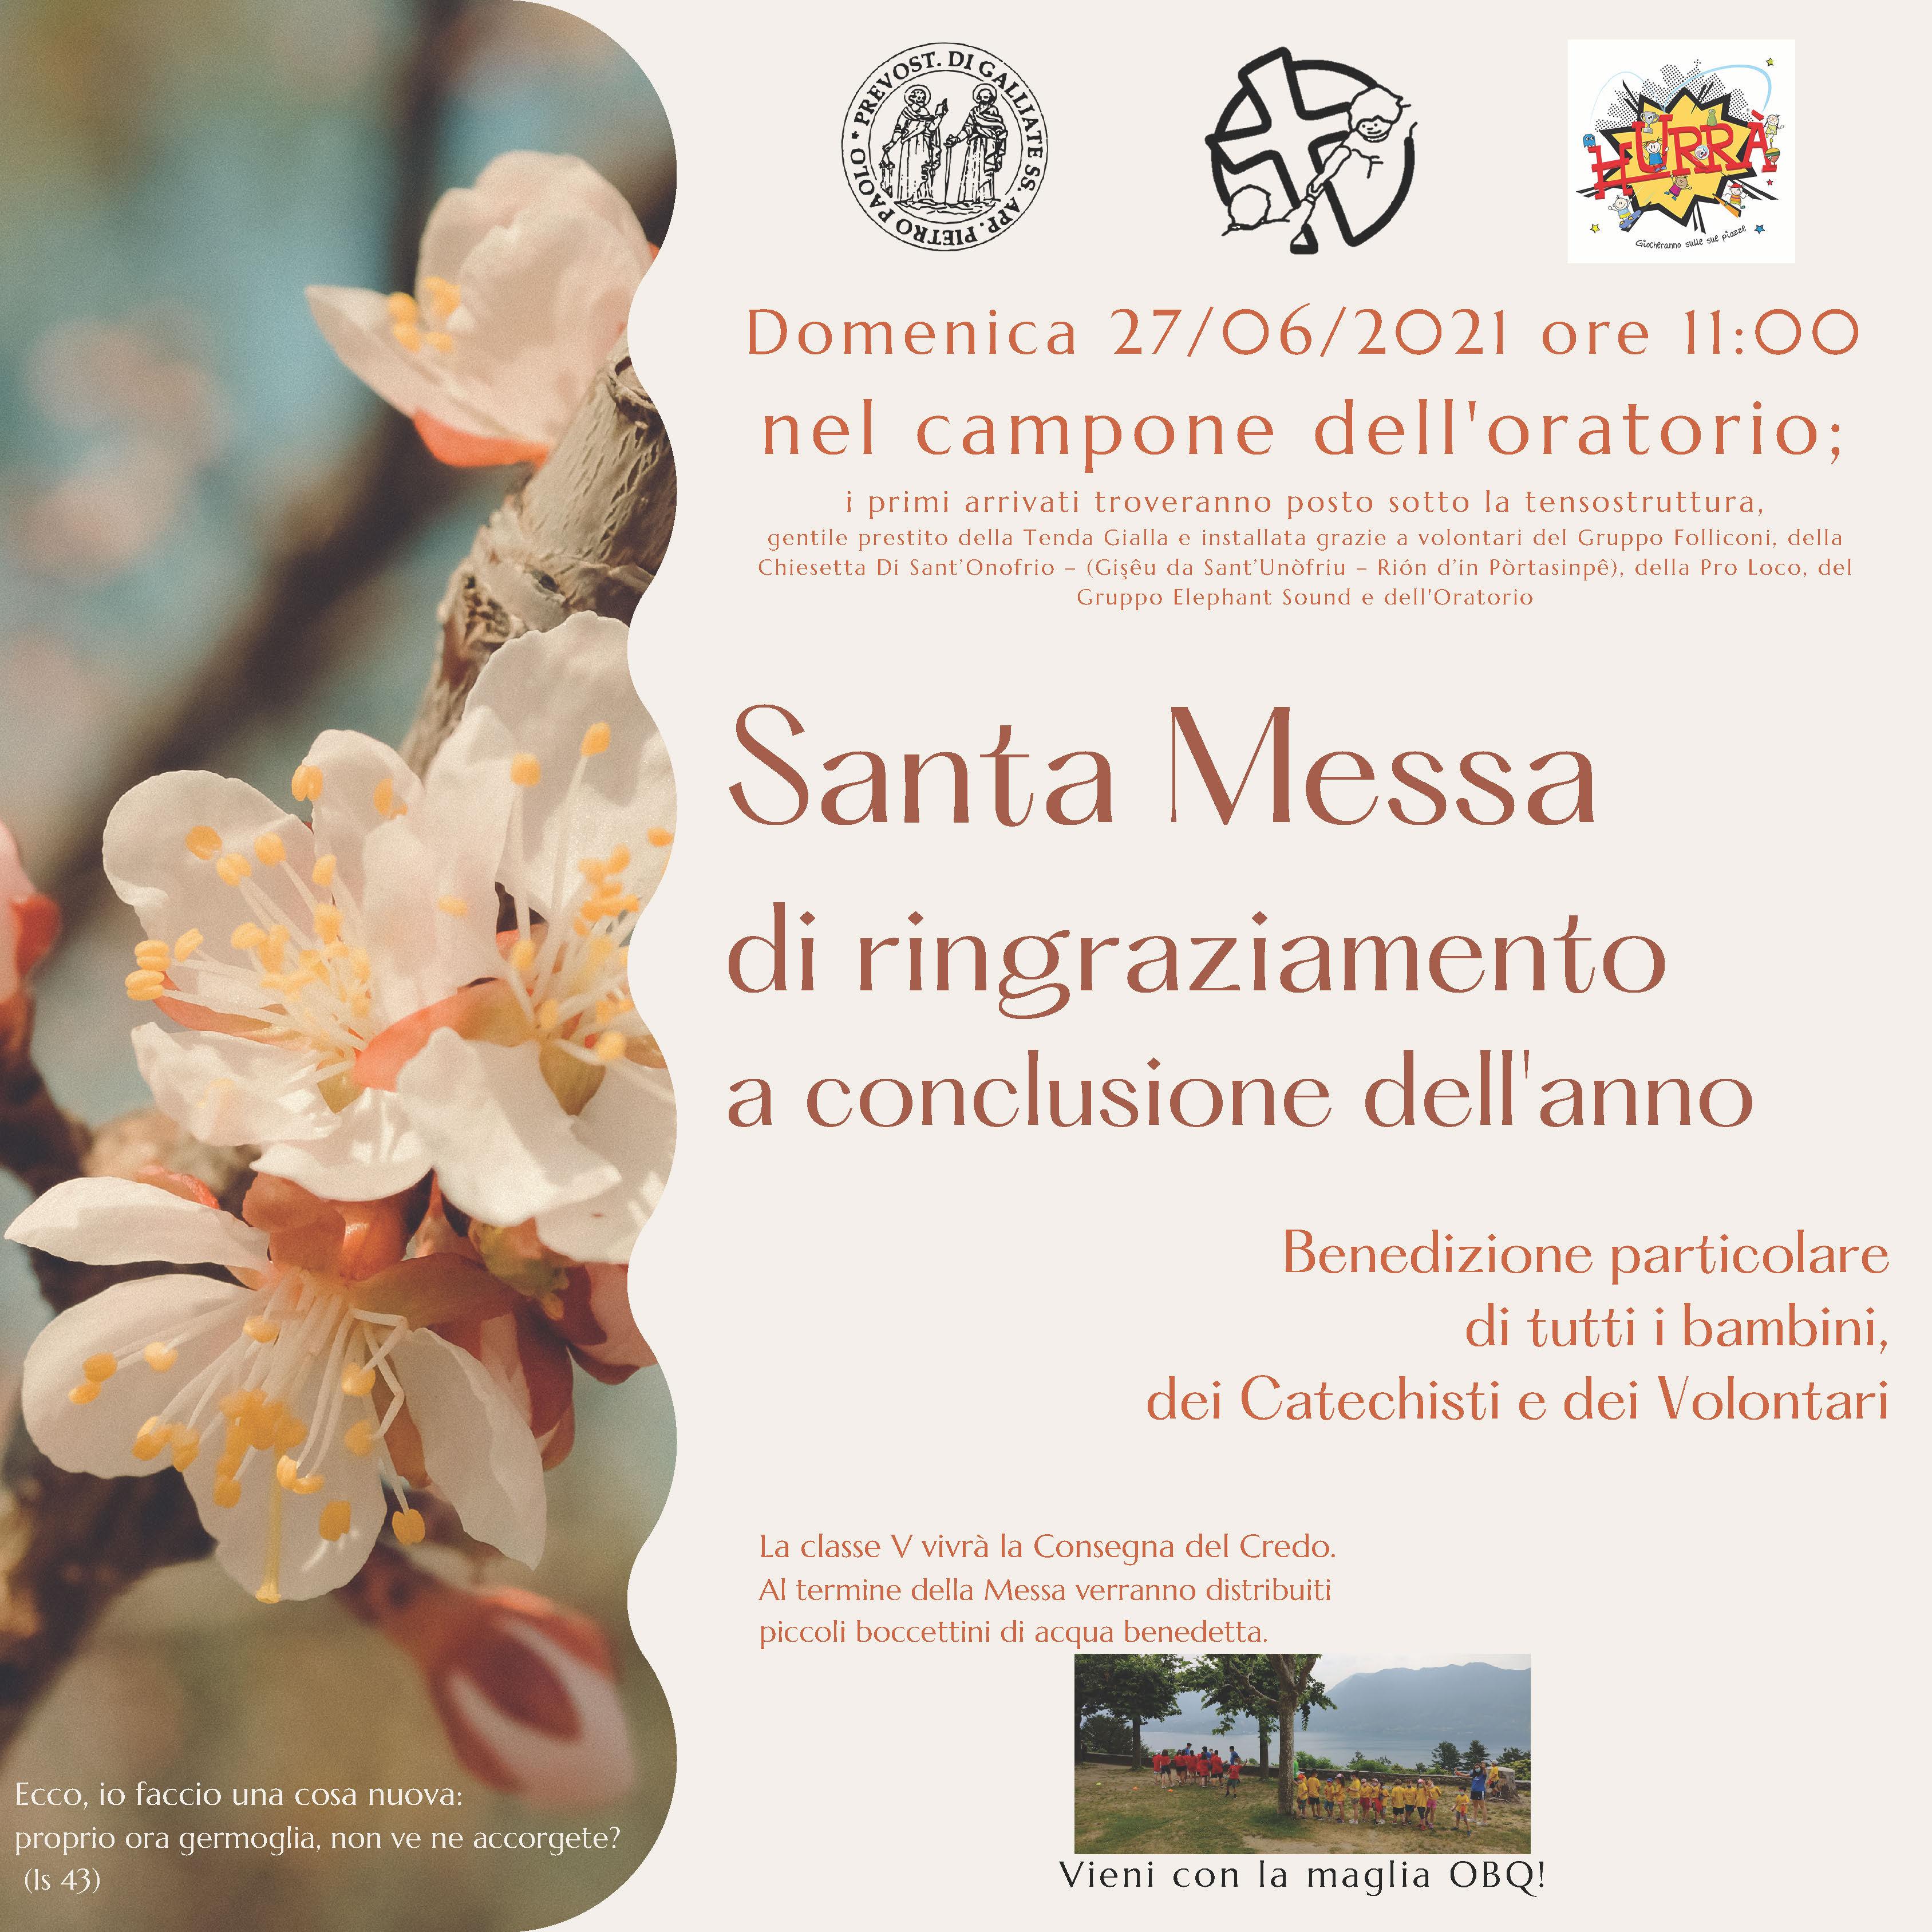 bp210627-SantaMessaOratorio-BenedizioneBambiniCatechistiVolontari